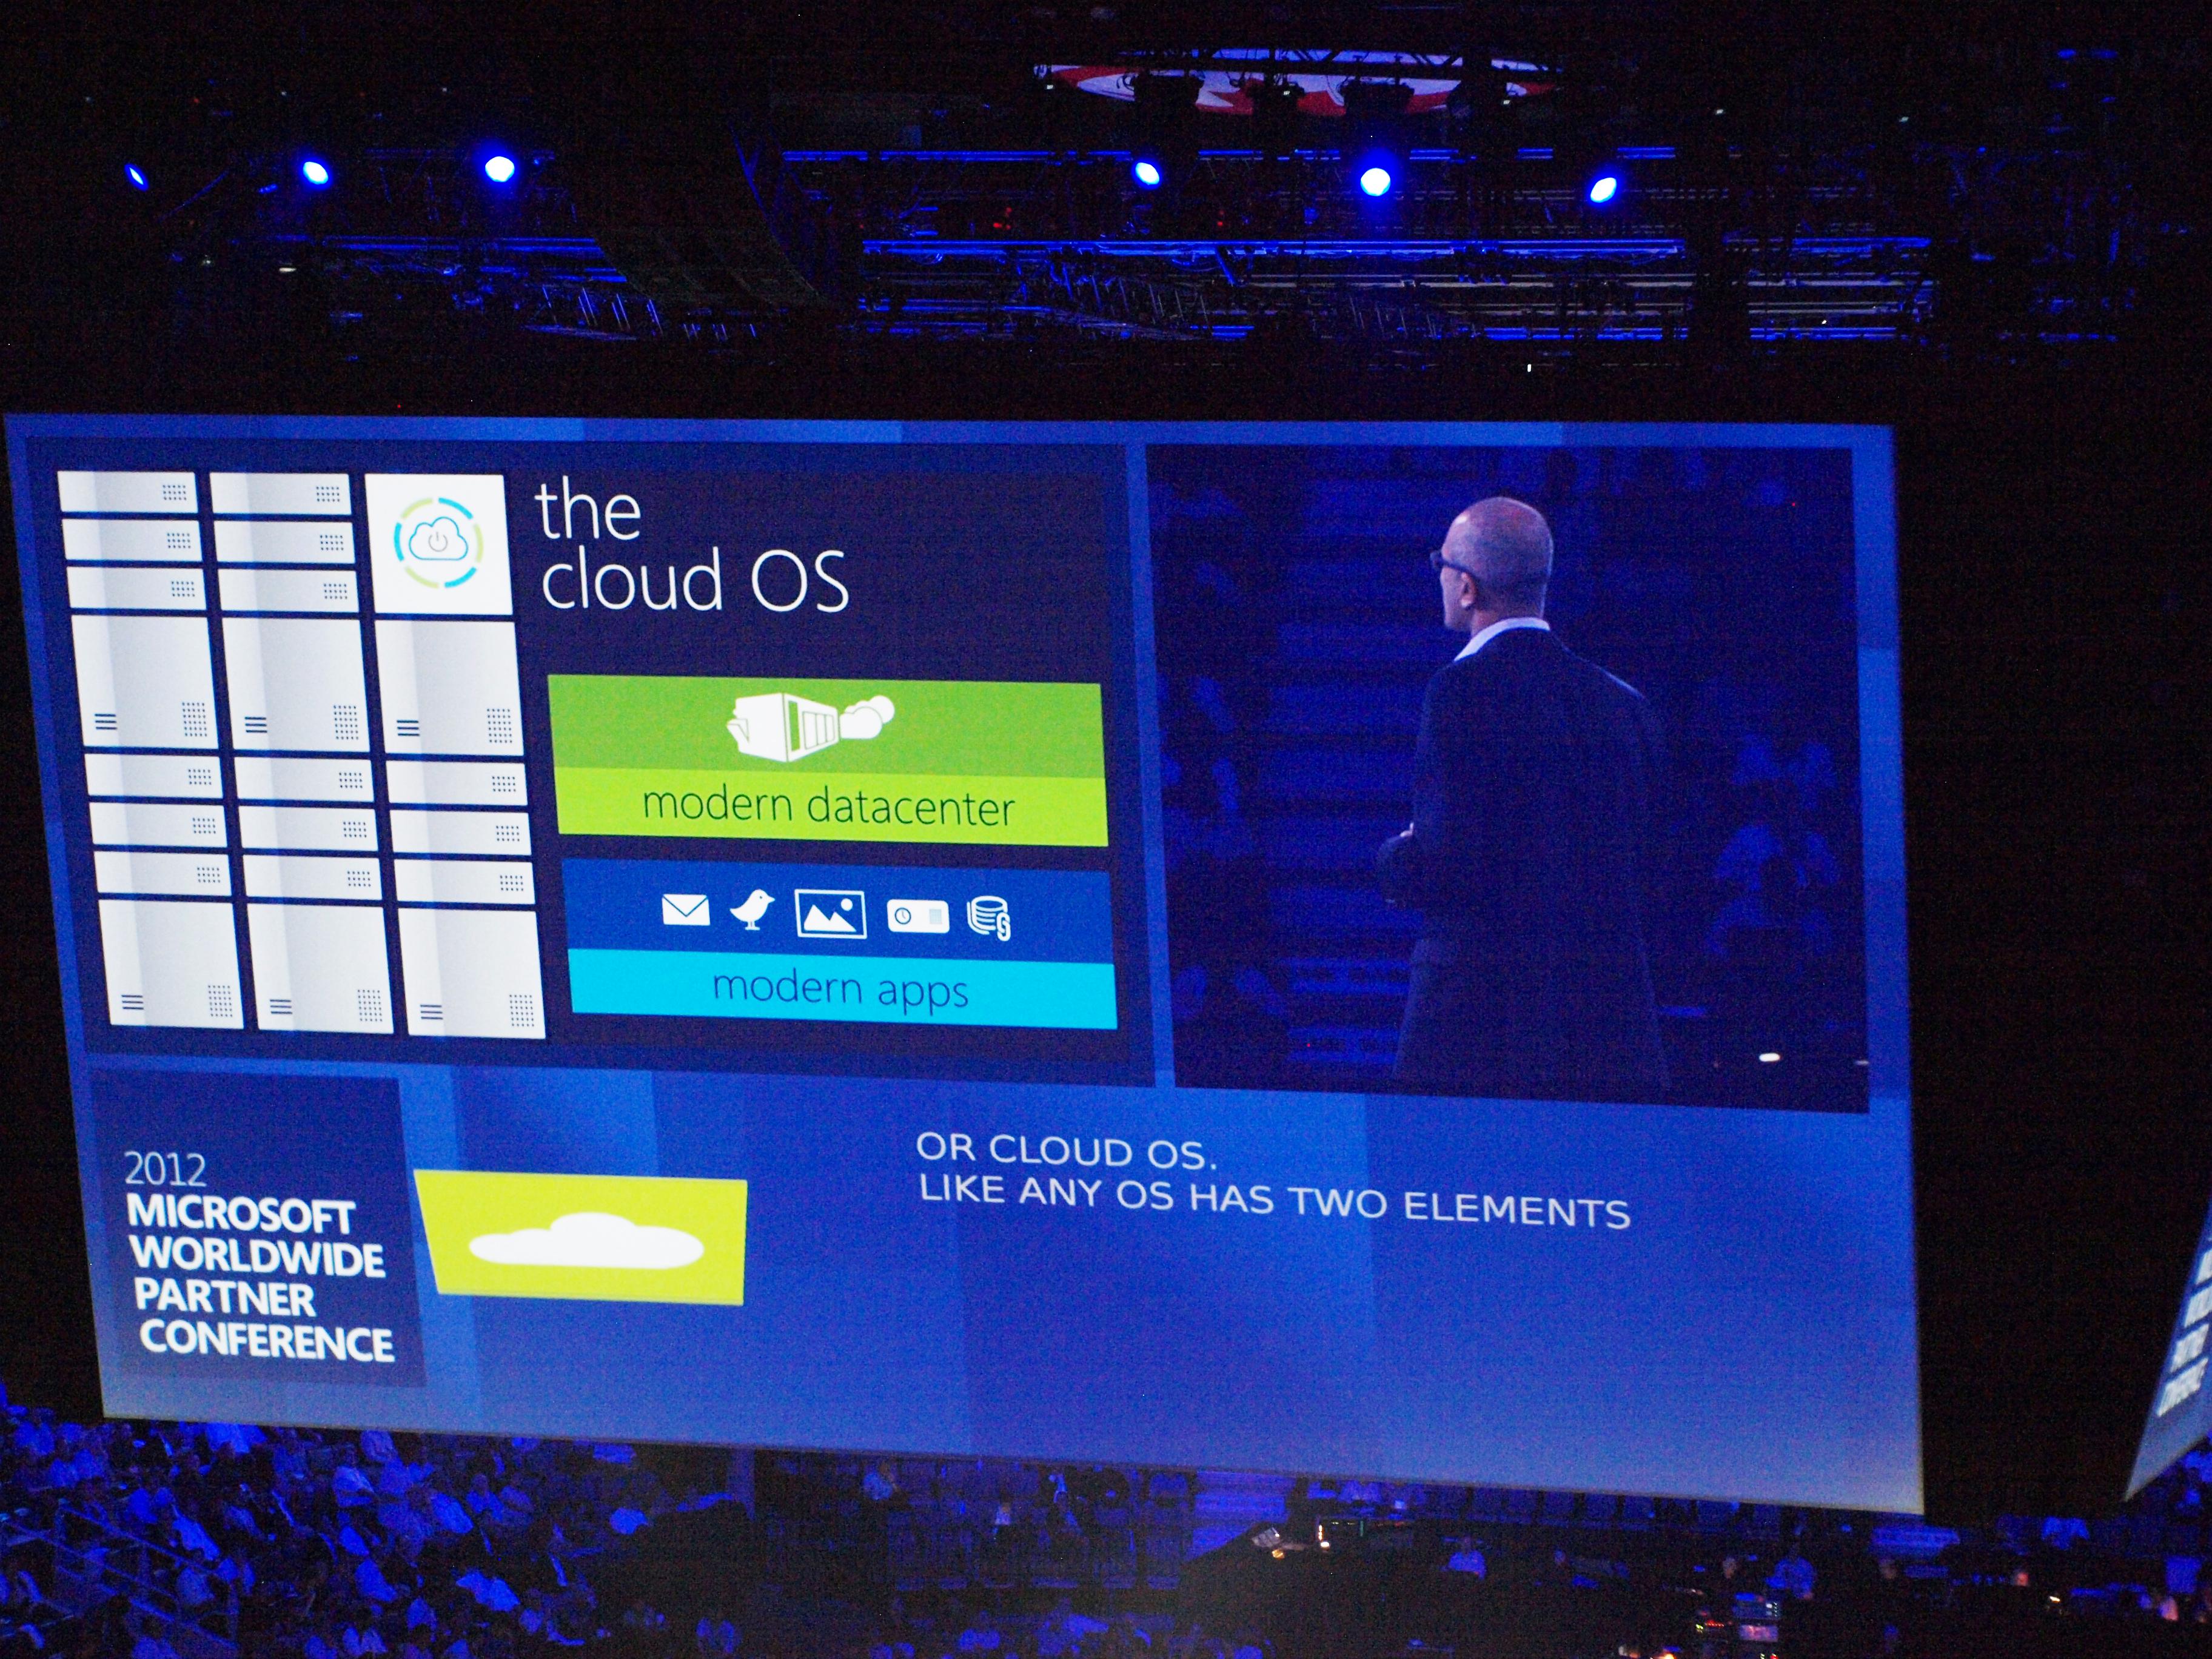 「Windows Server 2012は新たなクラウドOS。そしてクラウドOSに必要なのはモダンなデータセンターとモダンなアプリケーション」ナデラ氏